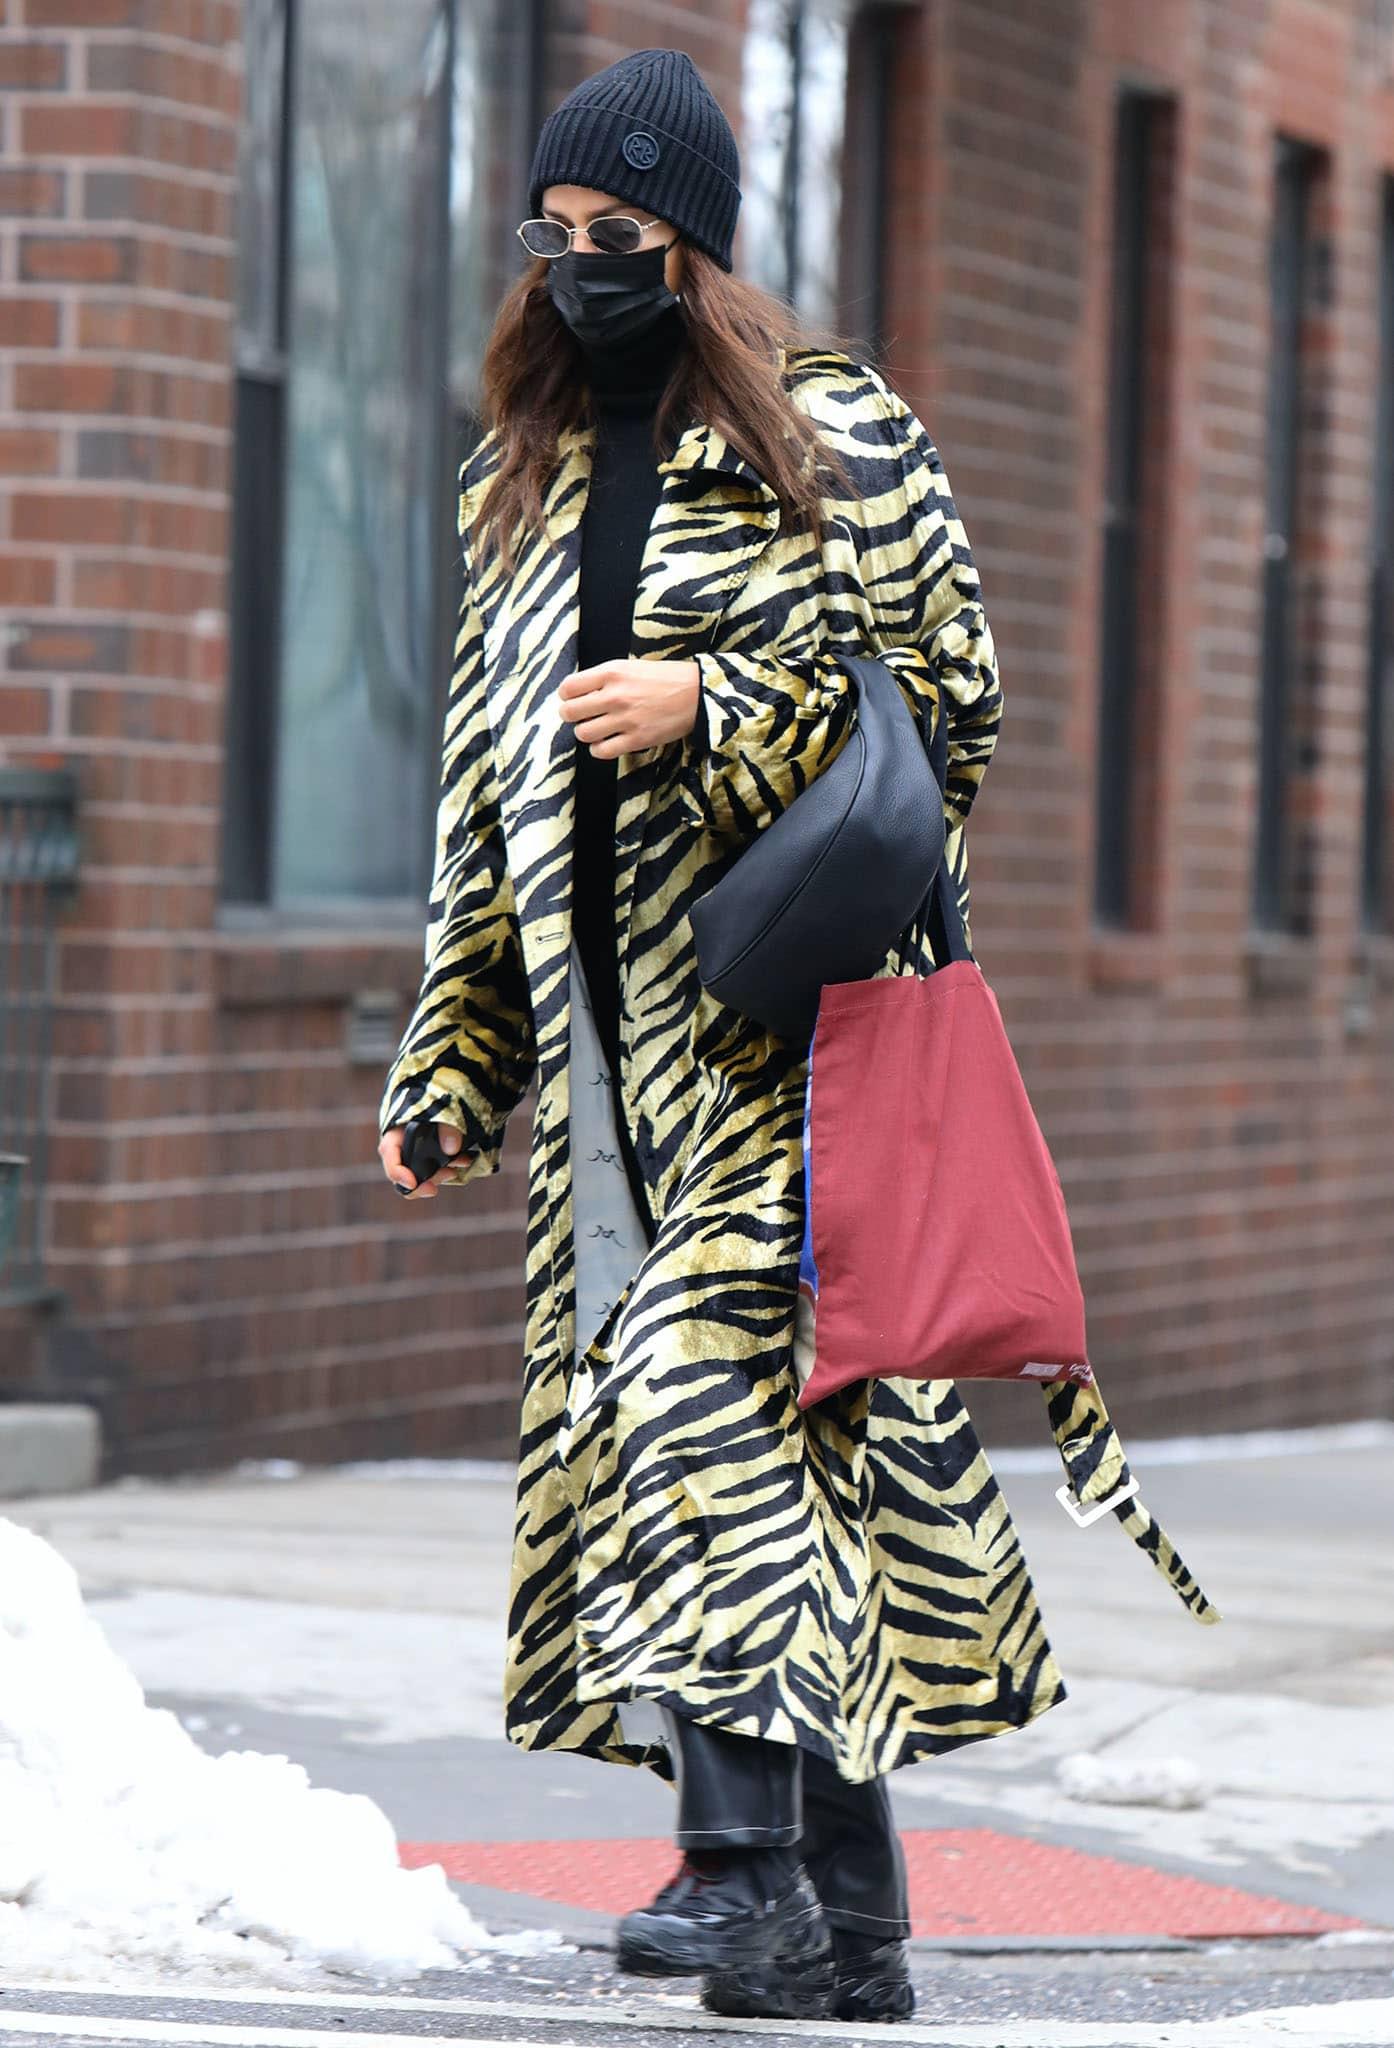 Irina Shayk runs errands in a tiger-print coat